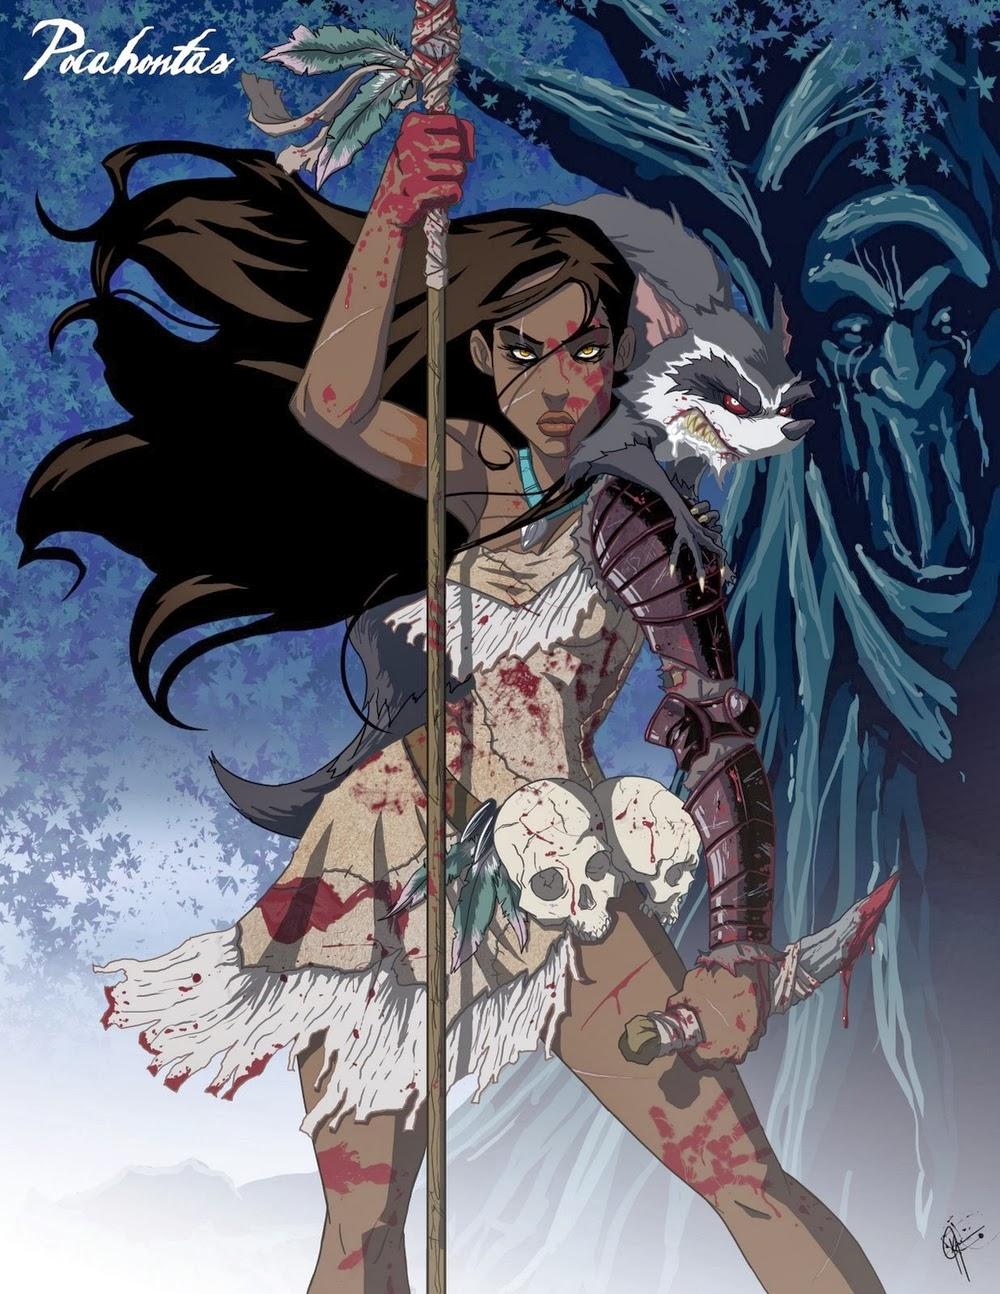 10-Pocahontas-Jeffrey-Thomas-Twisted-Princess-www-designstack-co